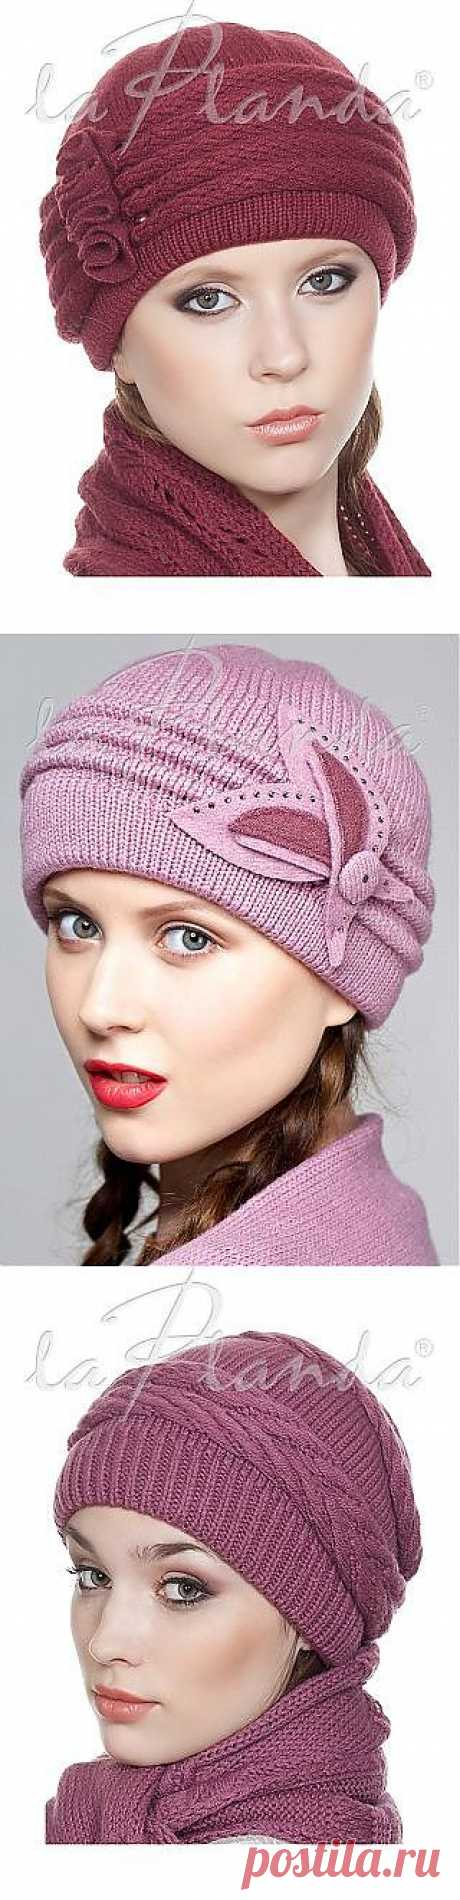 Fashionable female hats.